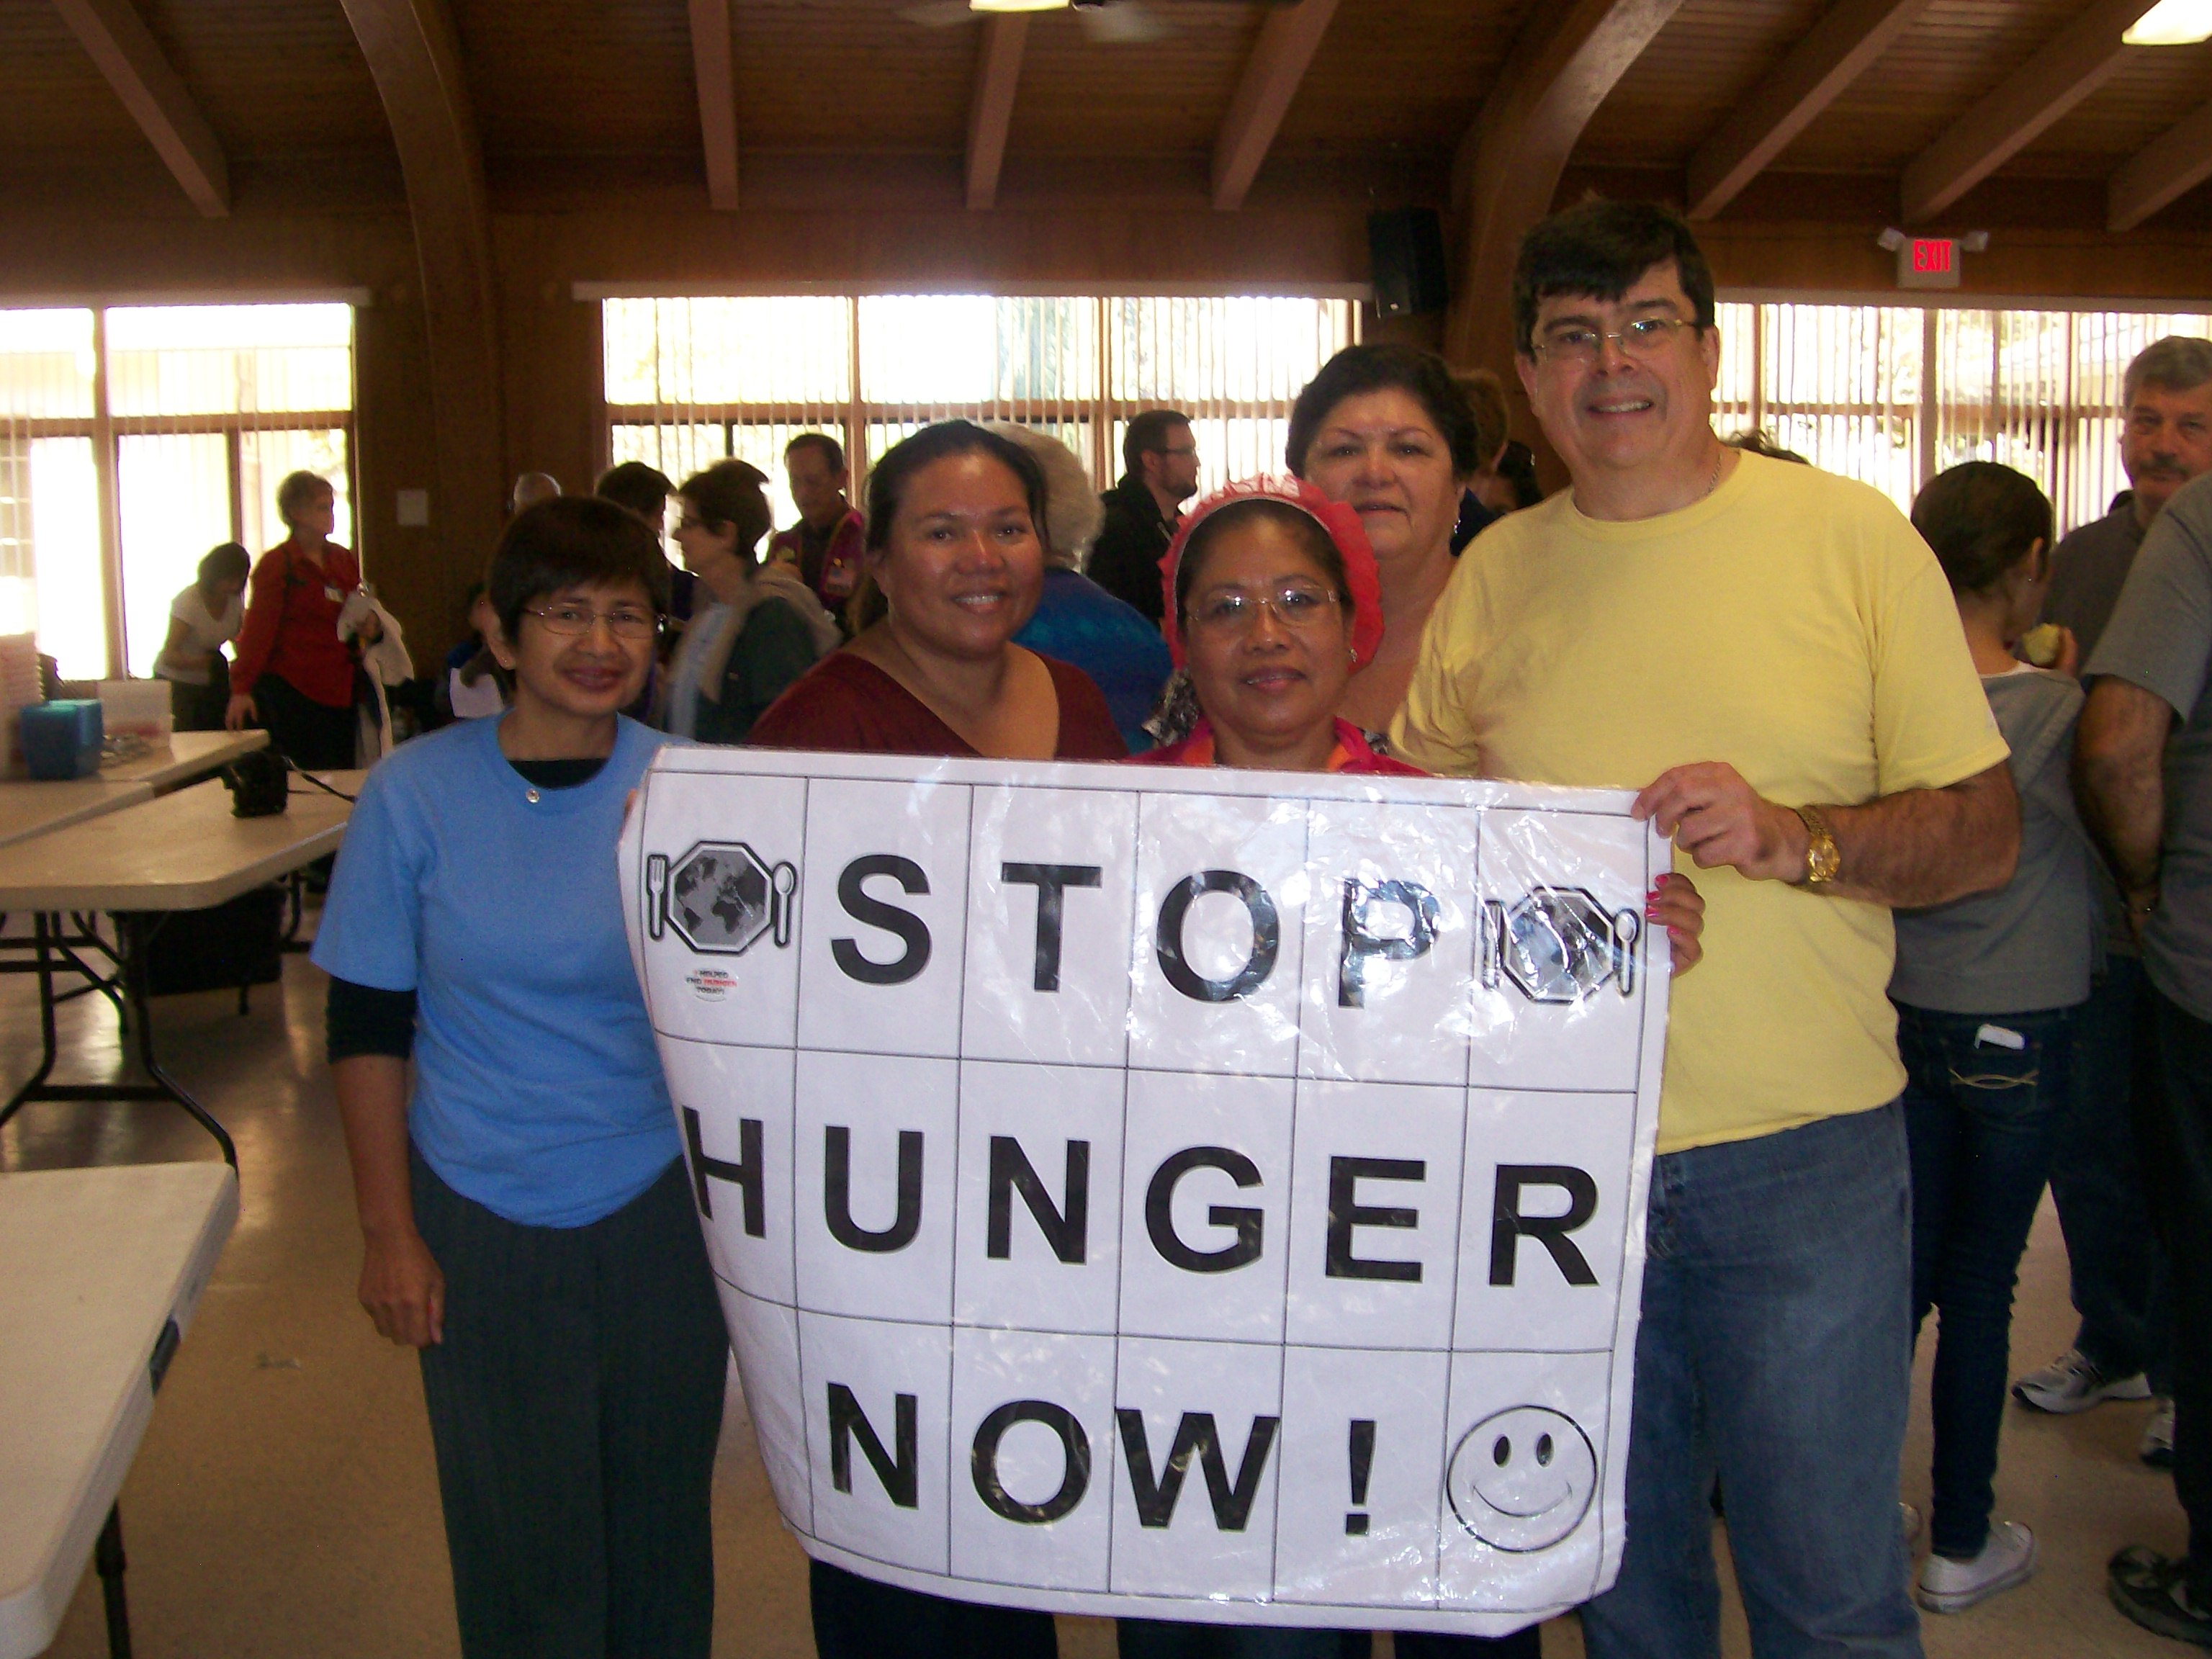 #MilpitasGatewayLions; #StopHungerNow